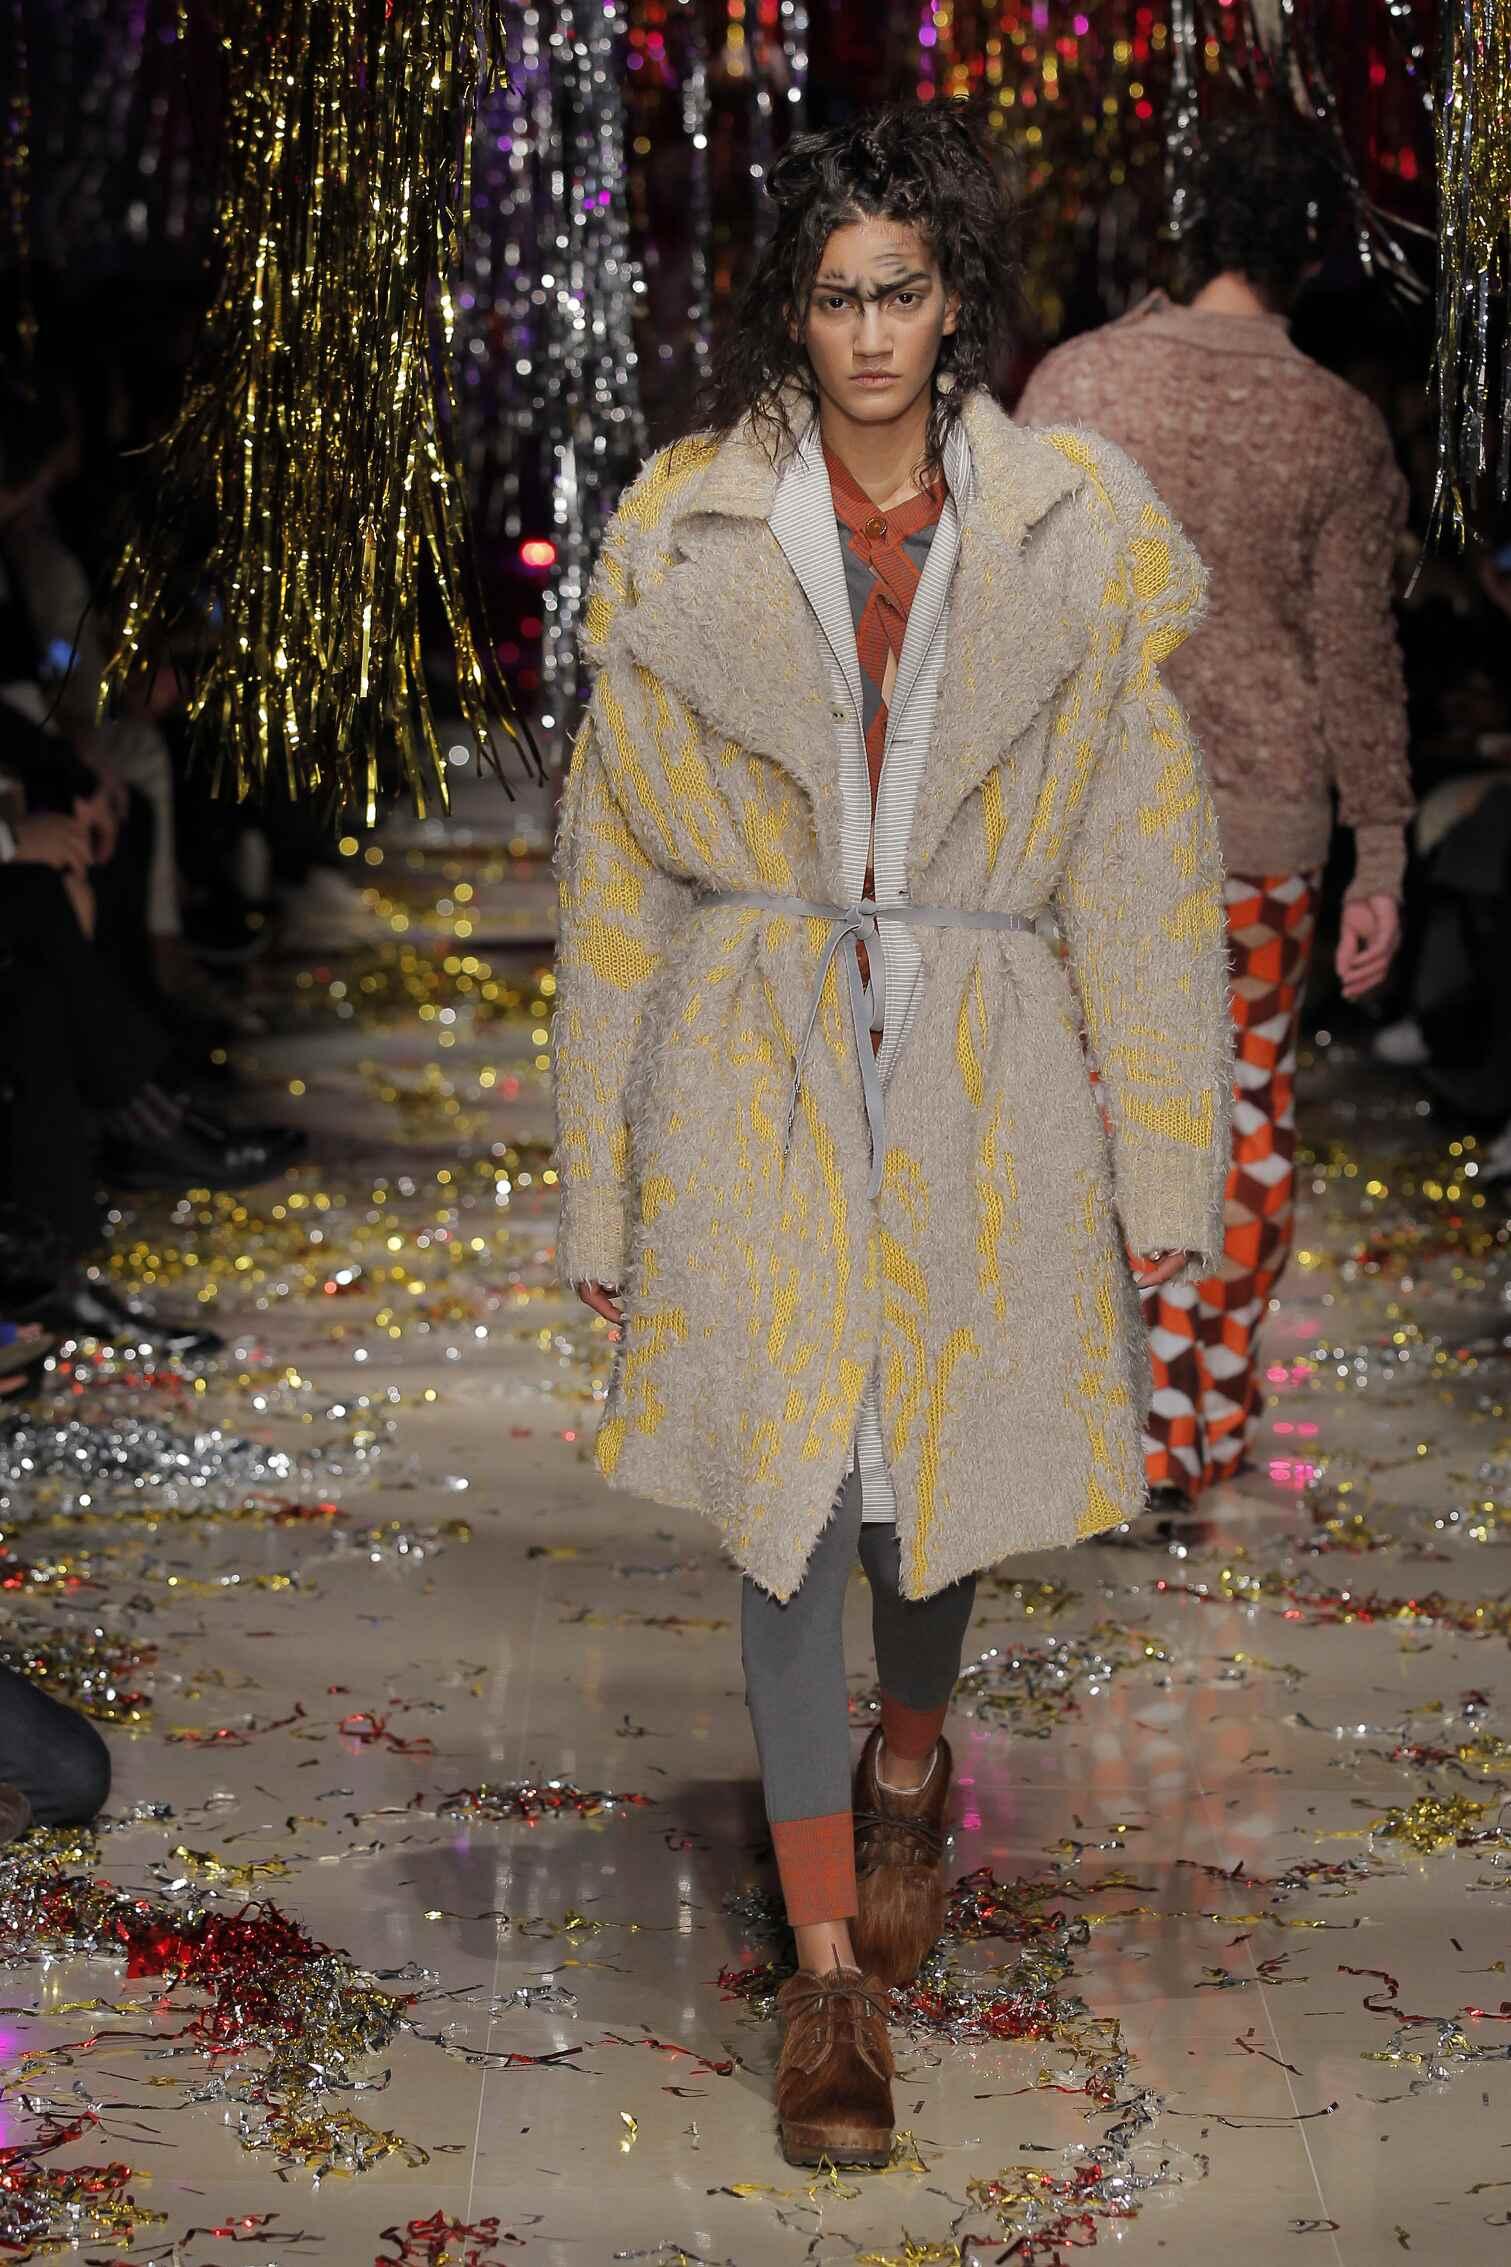 Catwalk Vivienne Westwood Gold Label Womenswear Collection Winter 2015